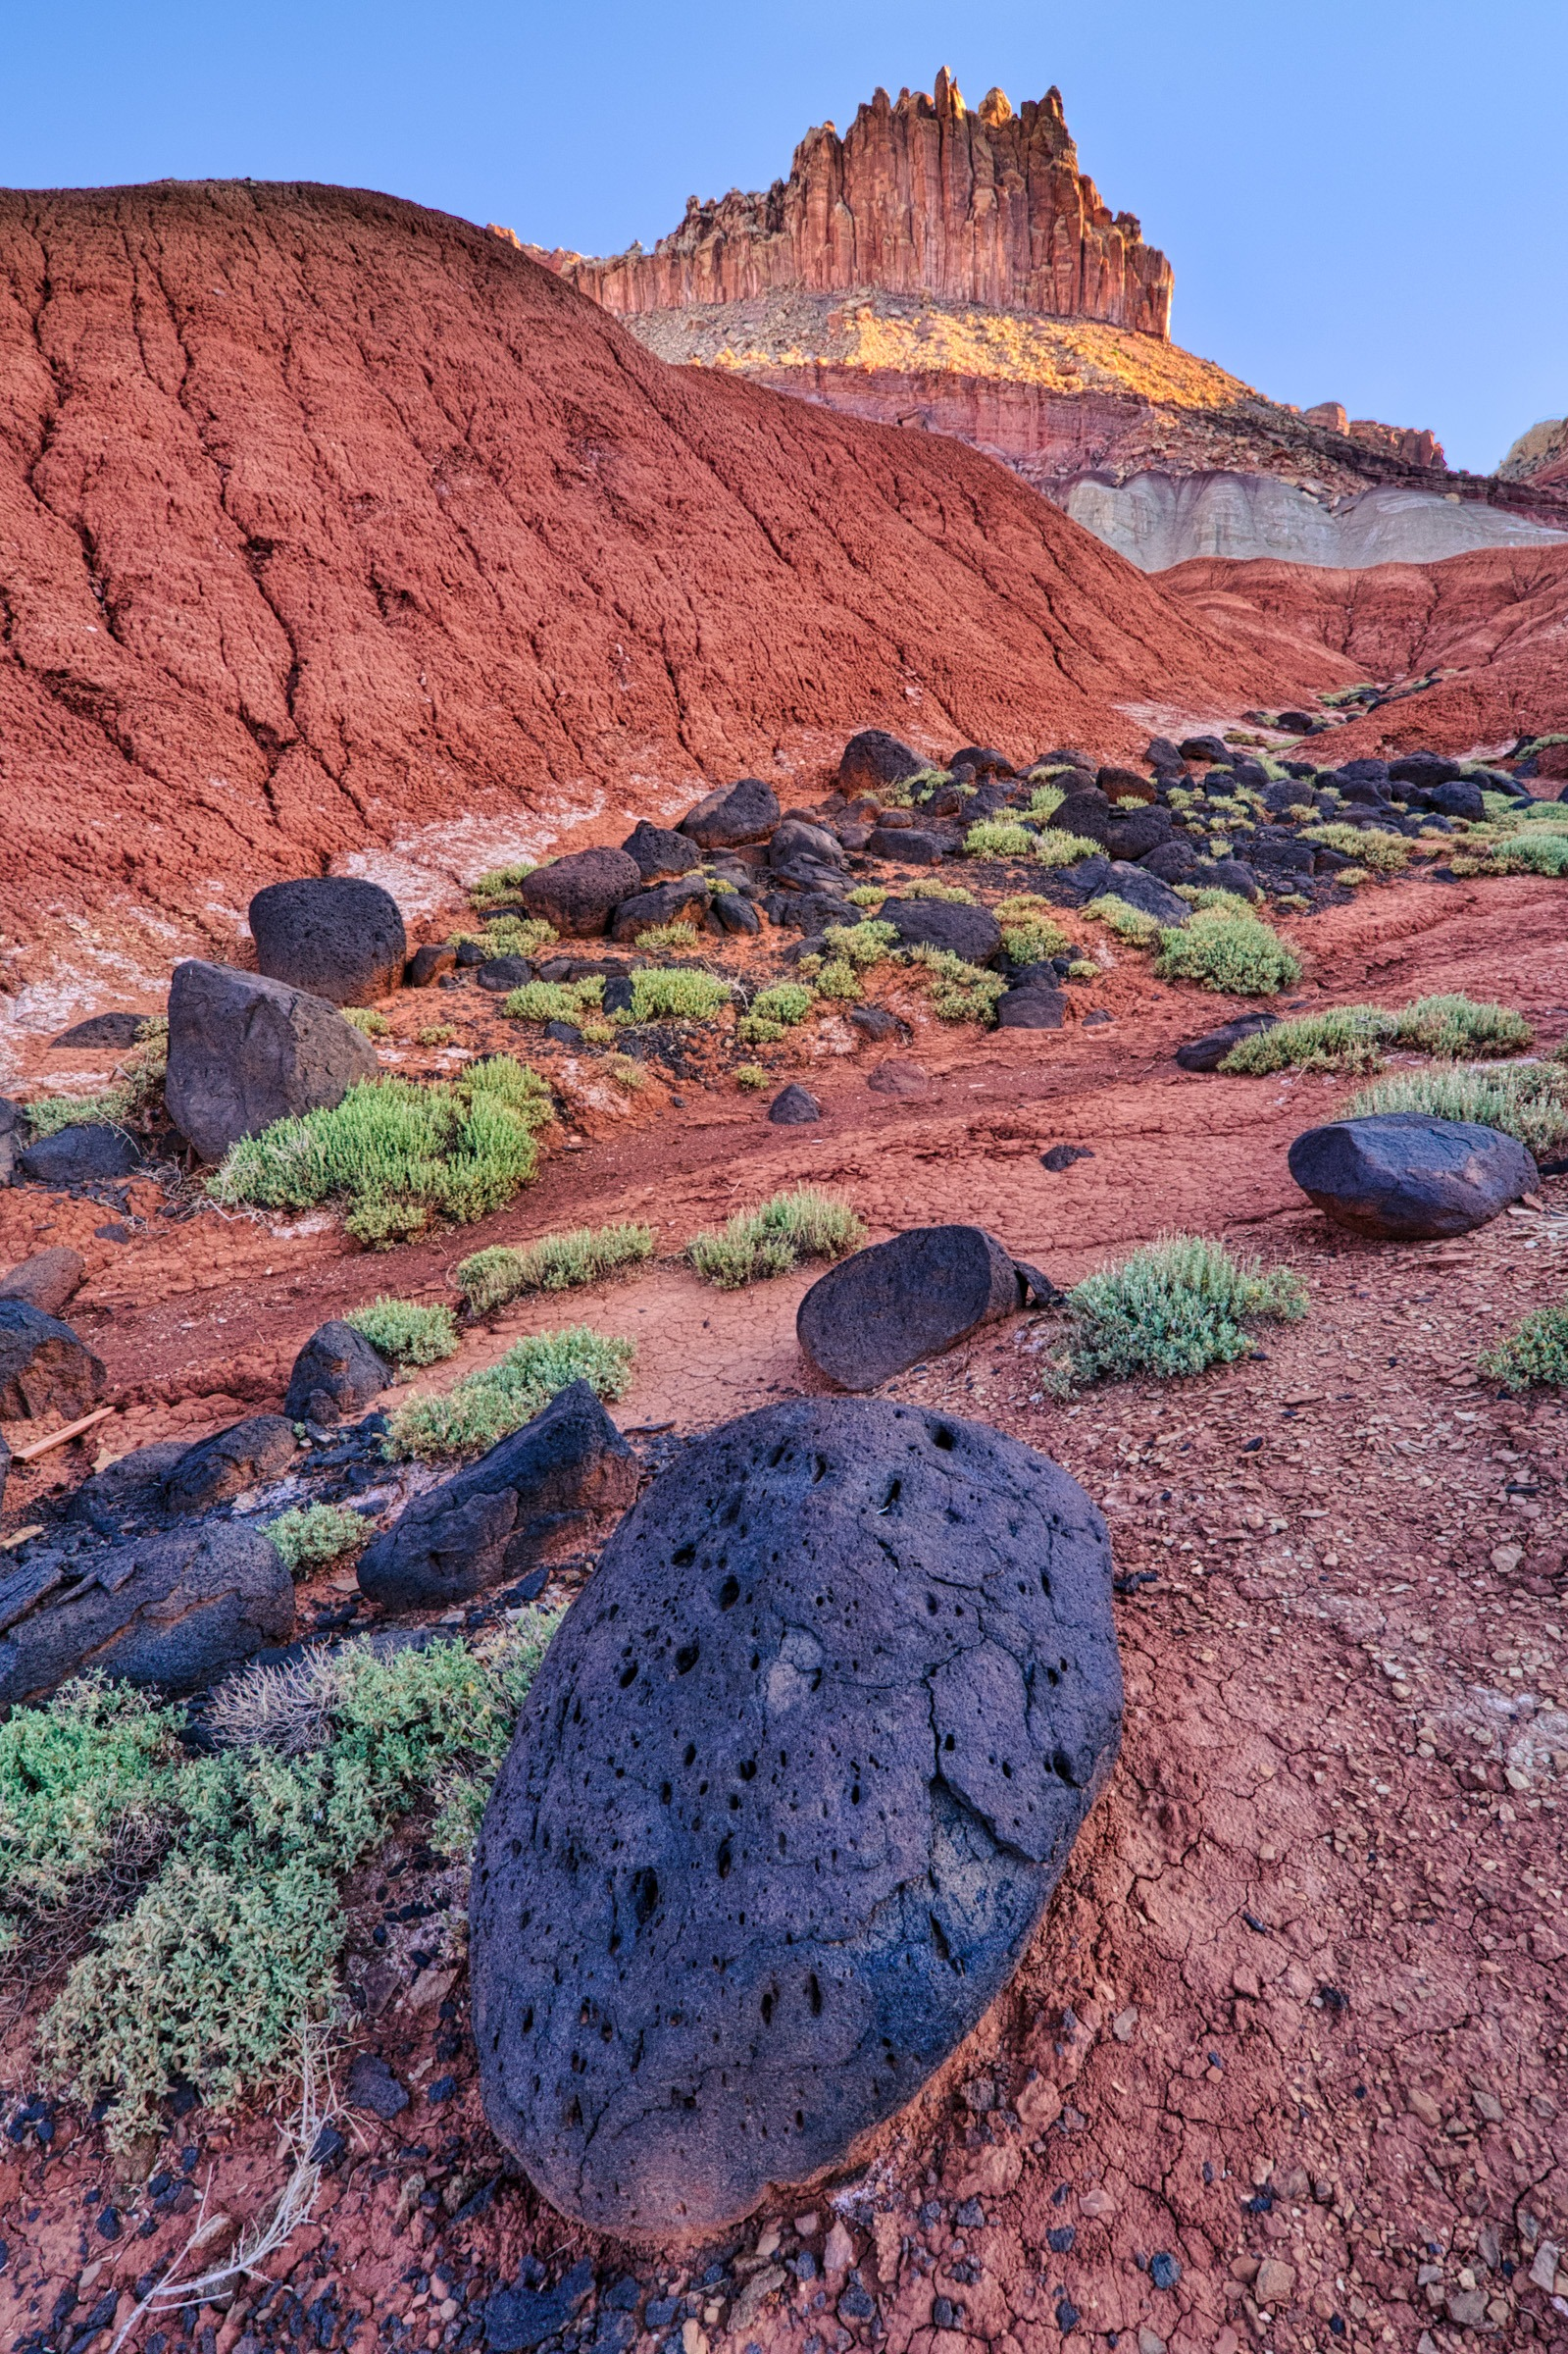 Basalt boulders along a washg descending from The Castle in Capitol Reef National Park.